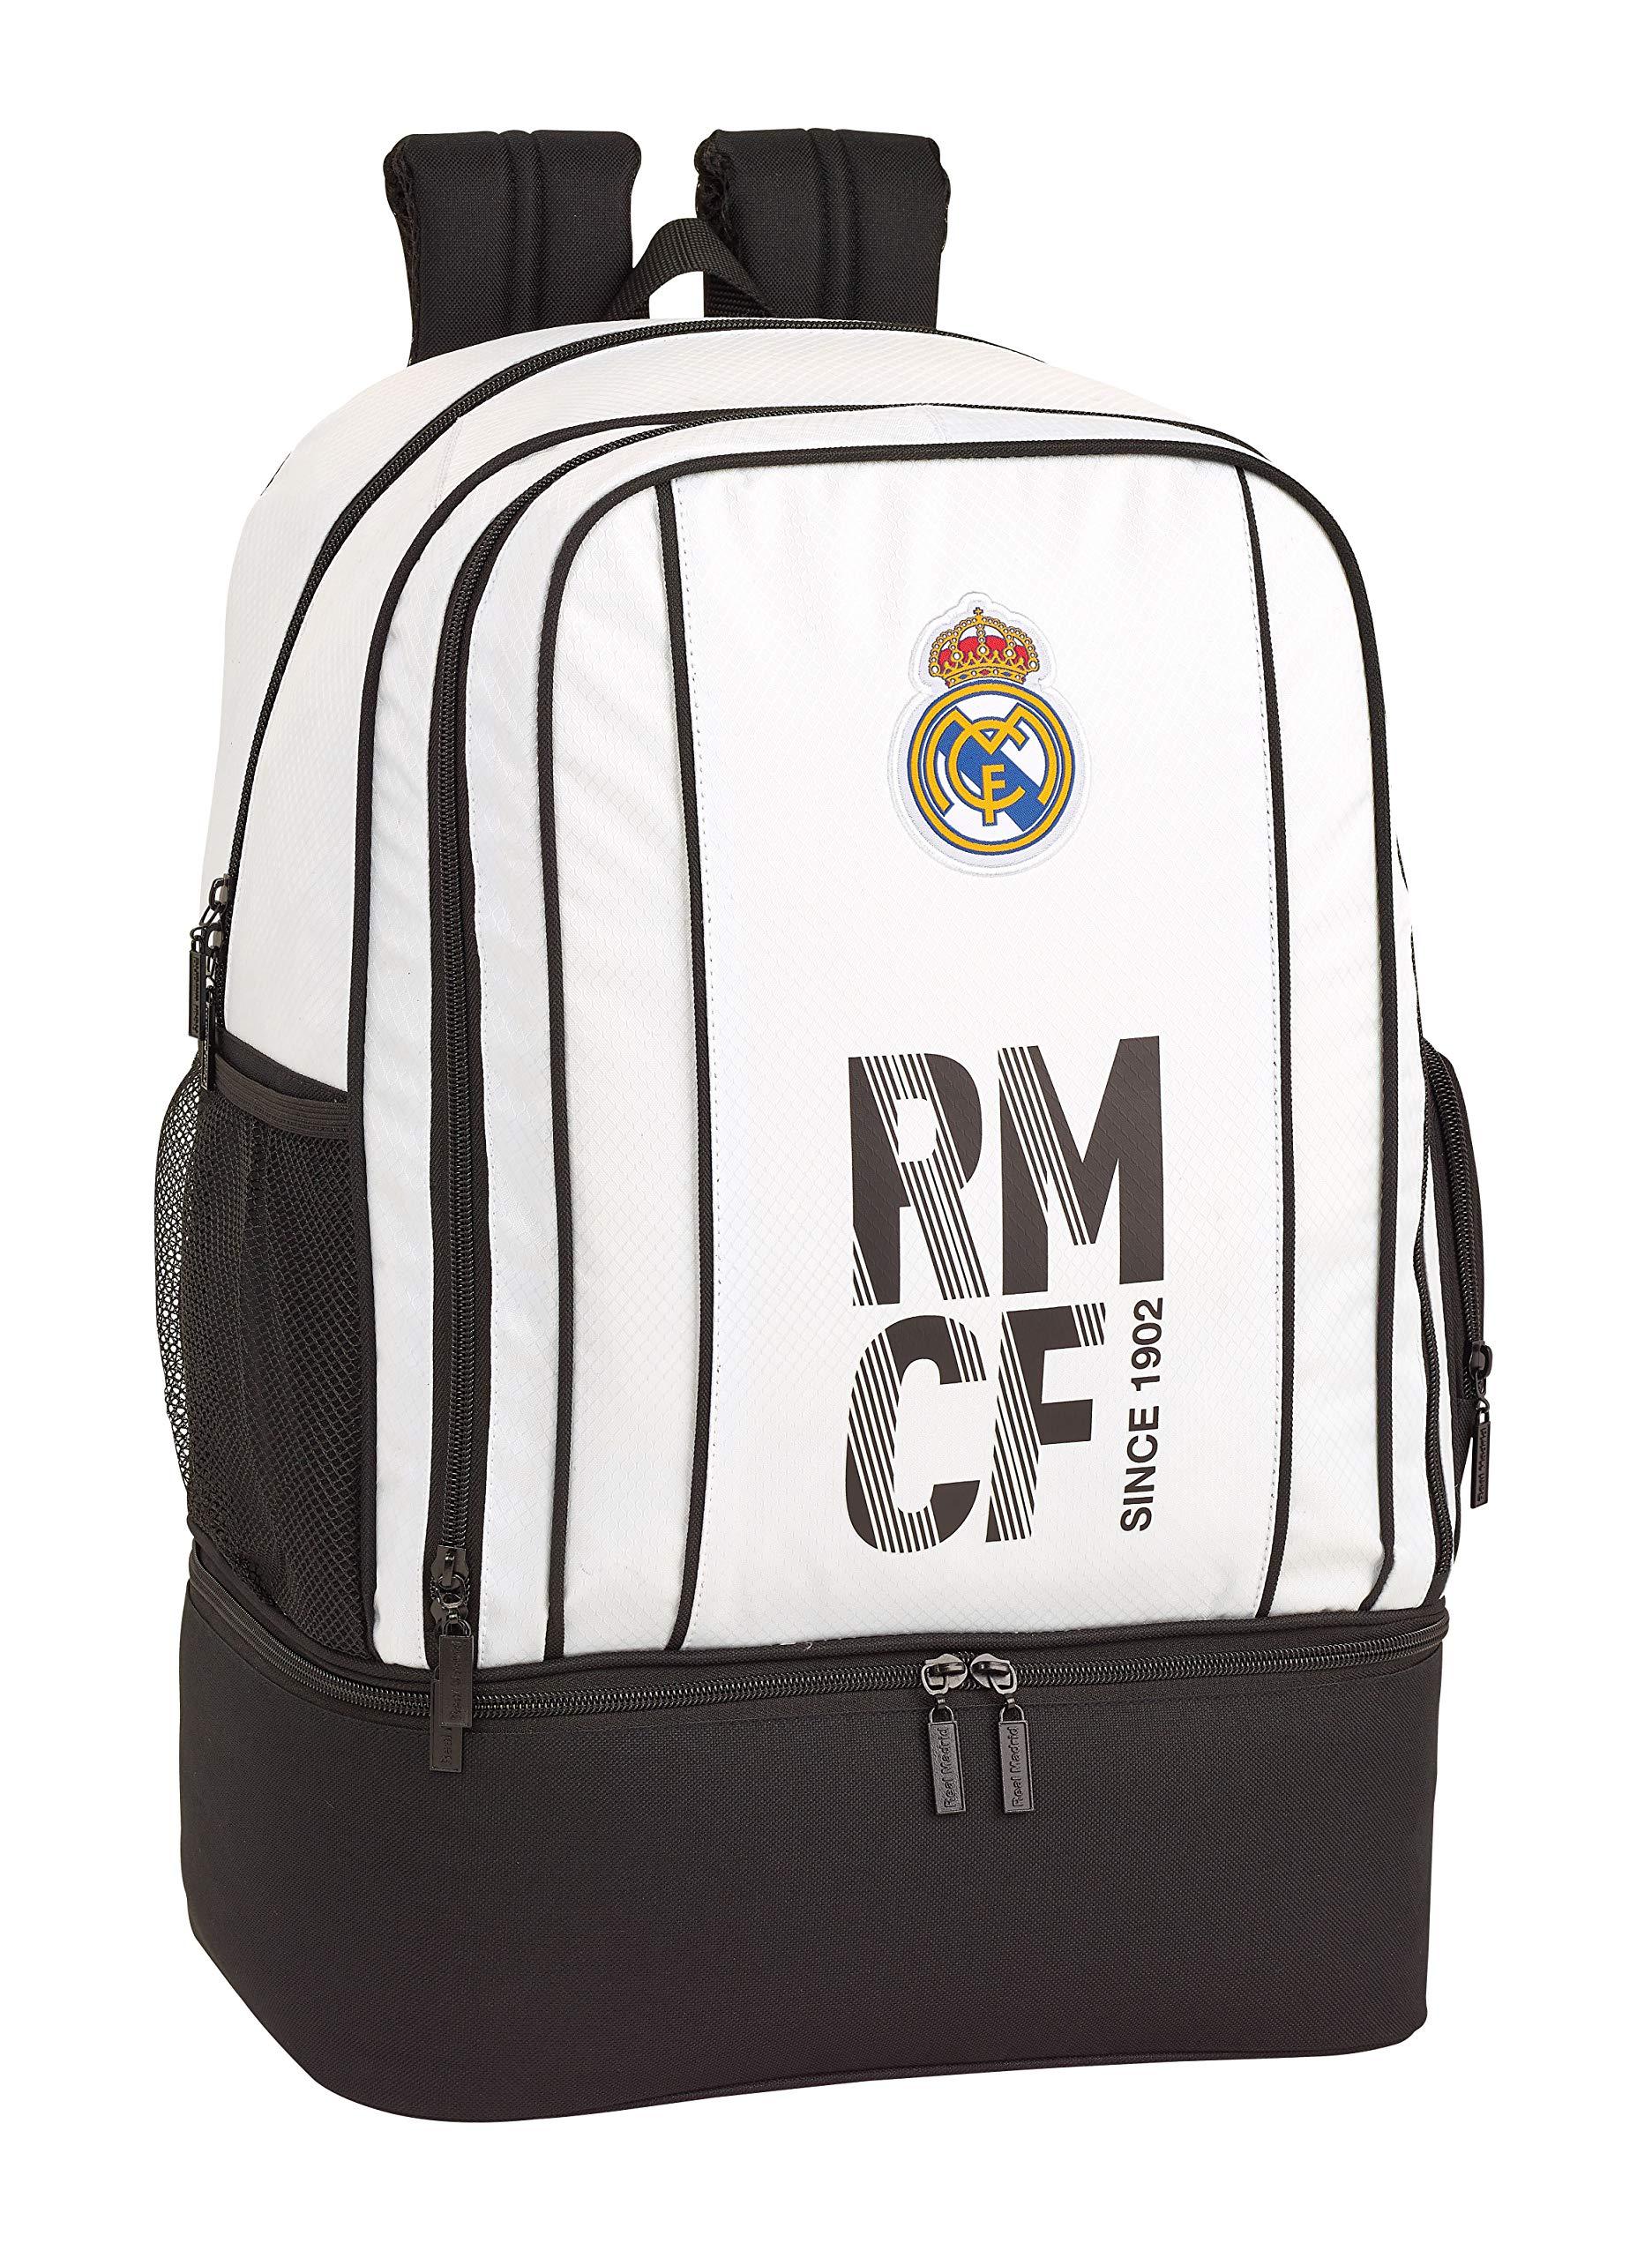 3b40abcbab5d5 Real Madrid 611854825 2018 Bolsa de Deporte 50 cm